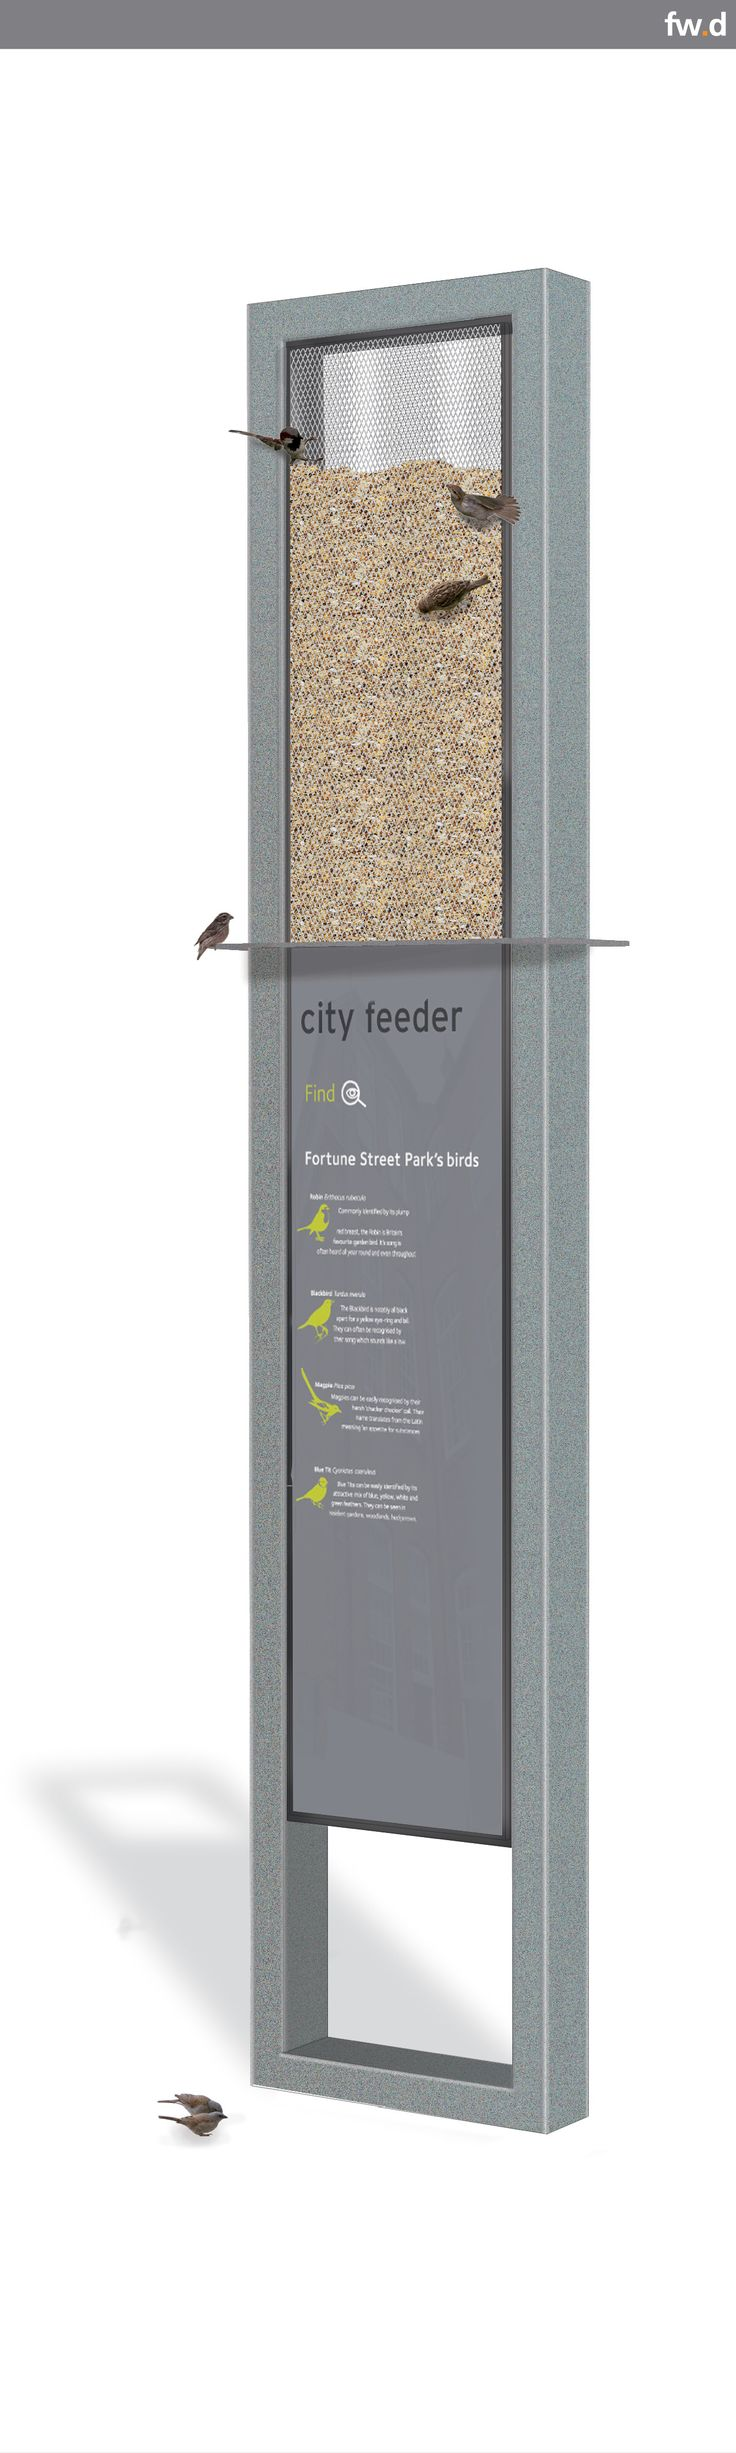 frank city bird feeder by fwdesign                                                                                                                                                                                 More